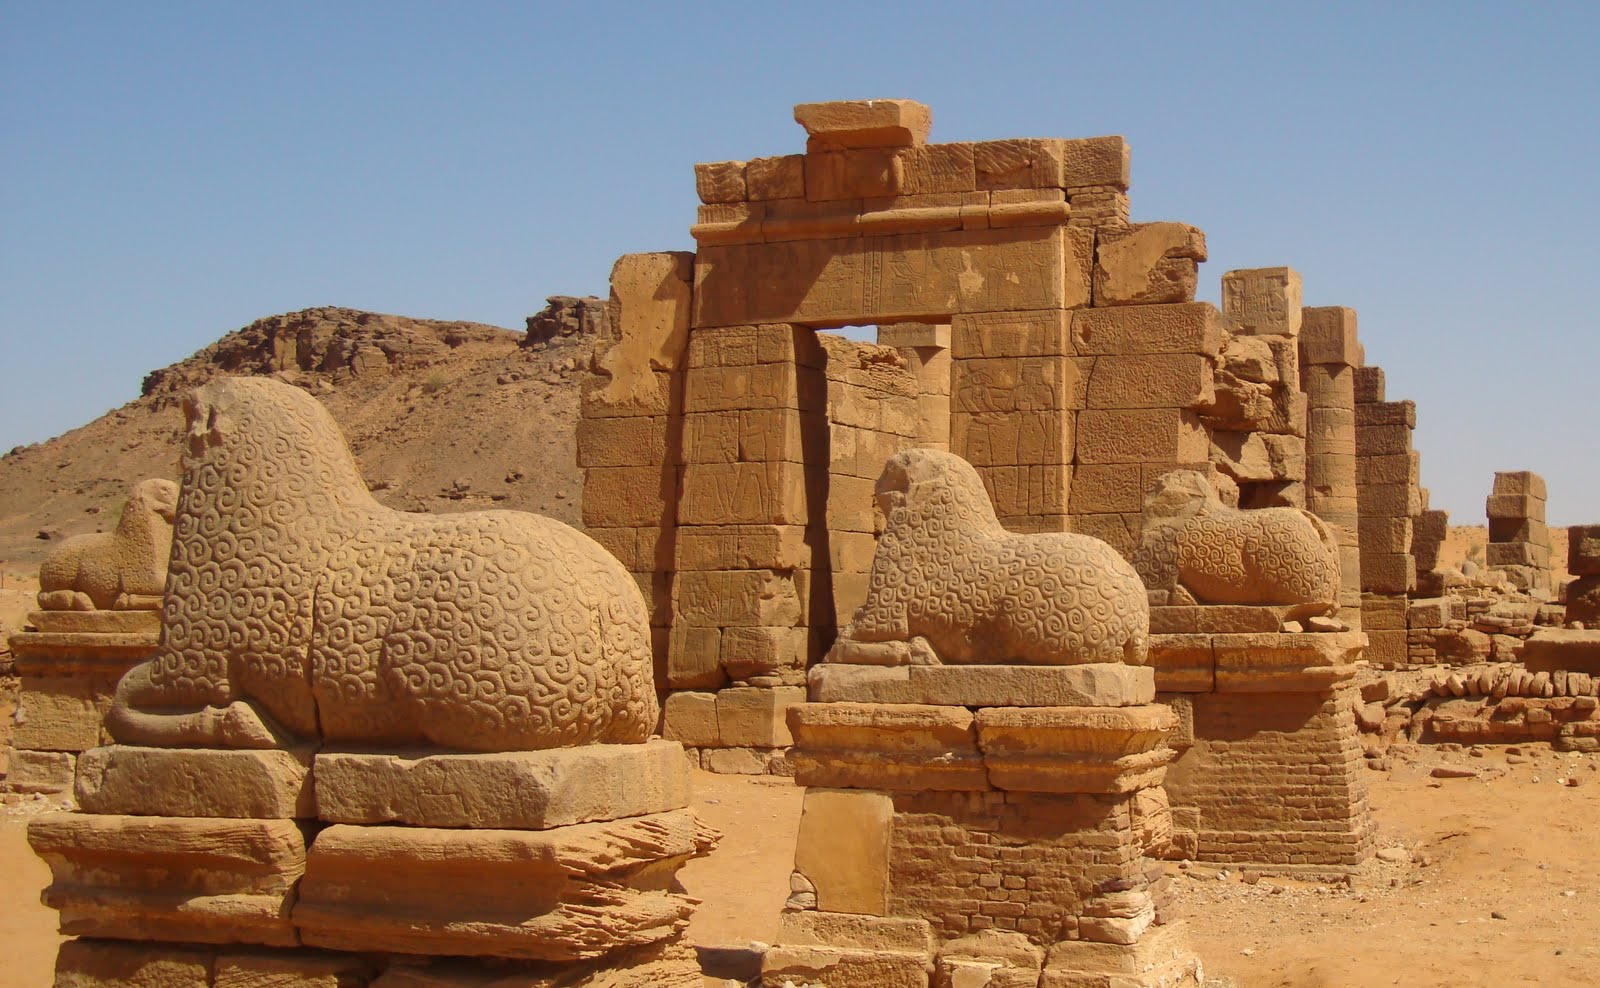 Ancient EGYPT (c. 5000-1786 B.C)